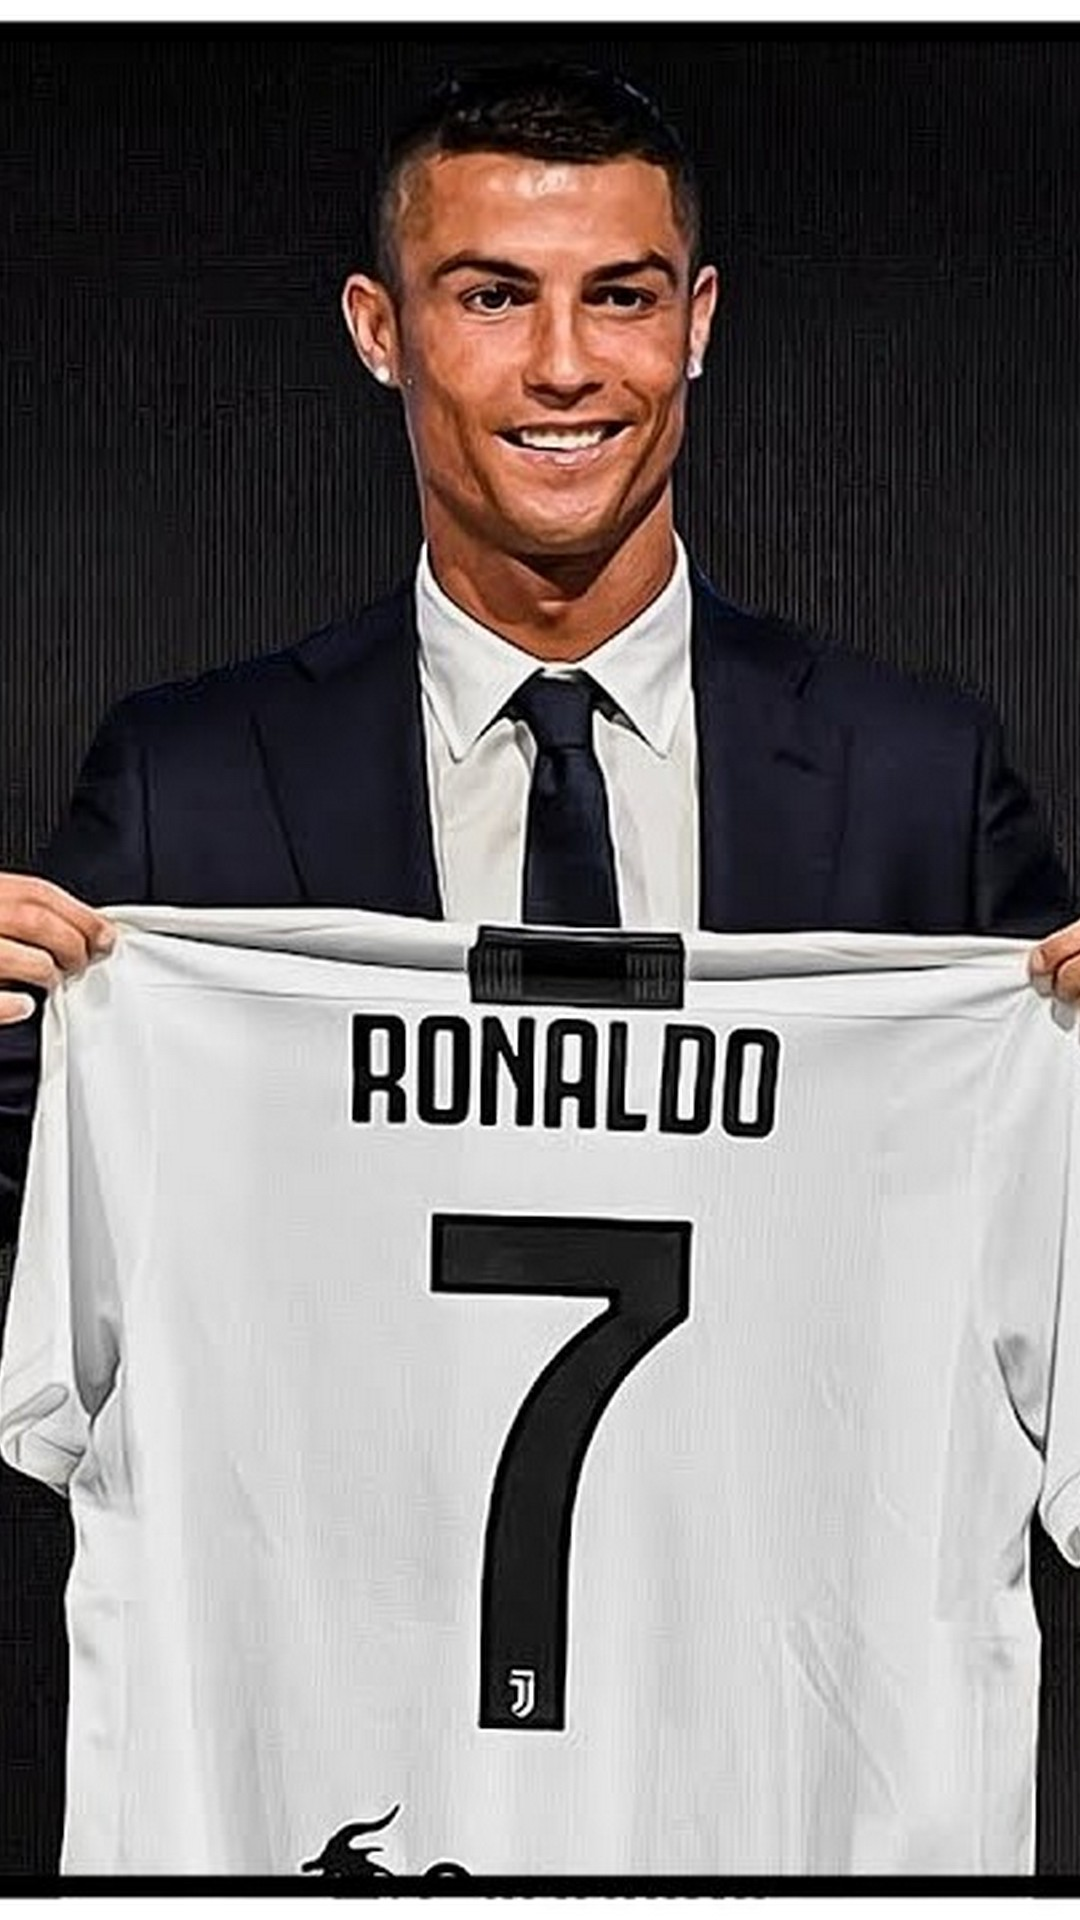 Wallpaper iPhone C Ronaldo Juventus 2020 3D iPhone Wallpaper 1080x1920